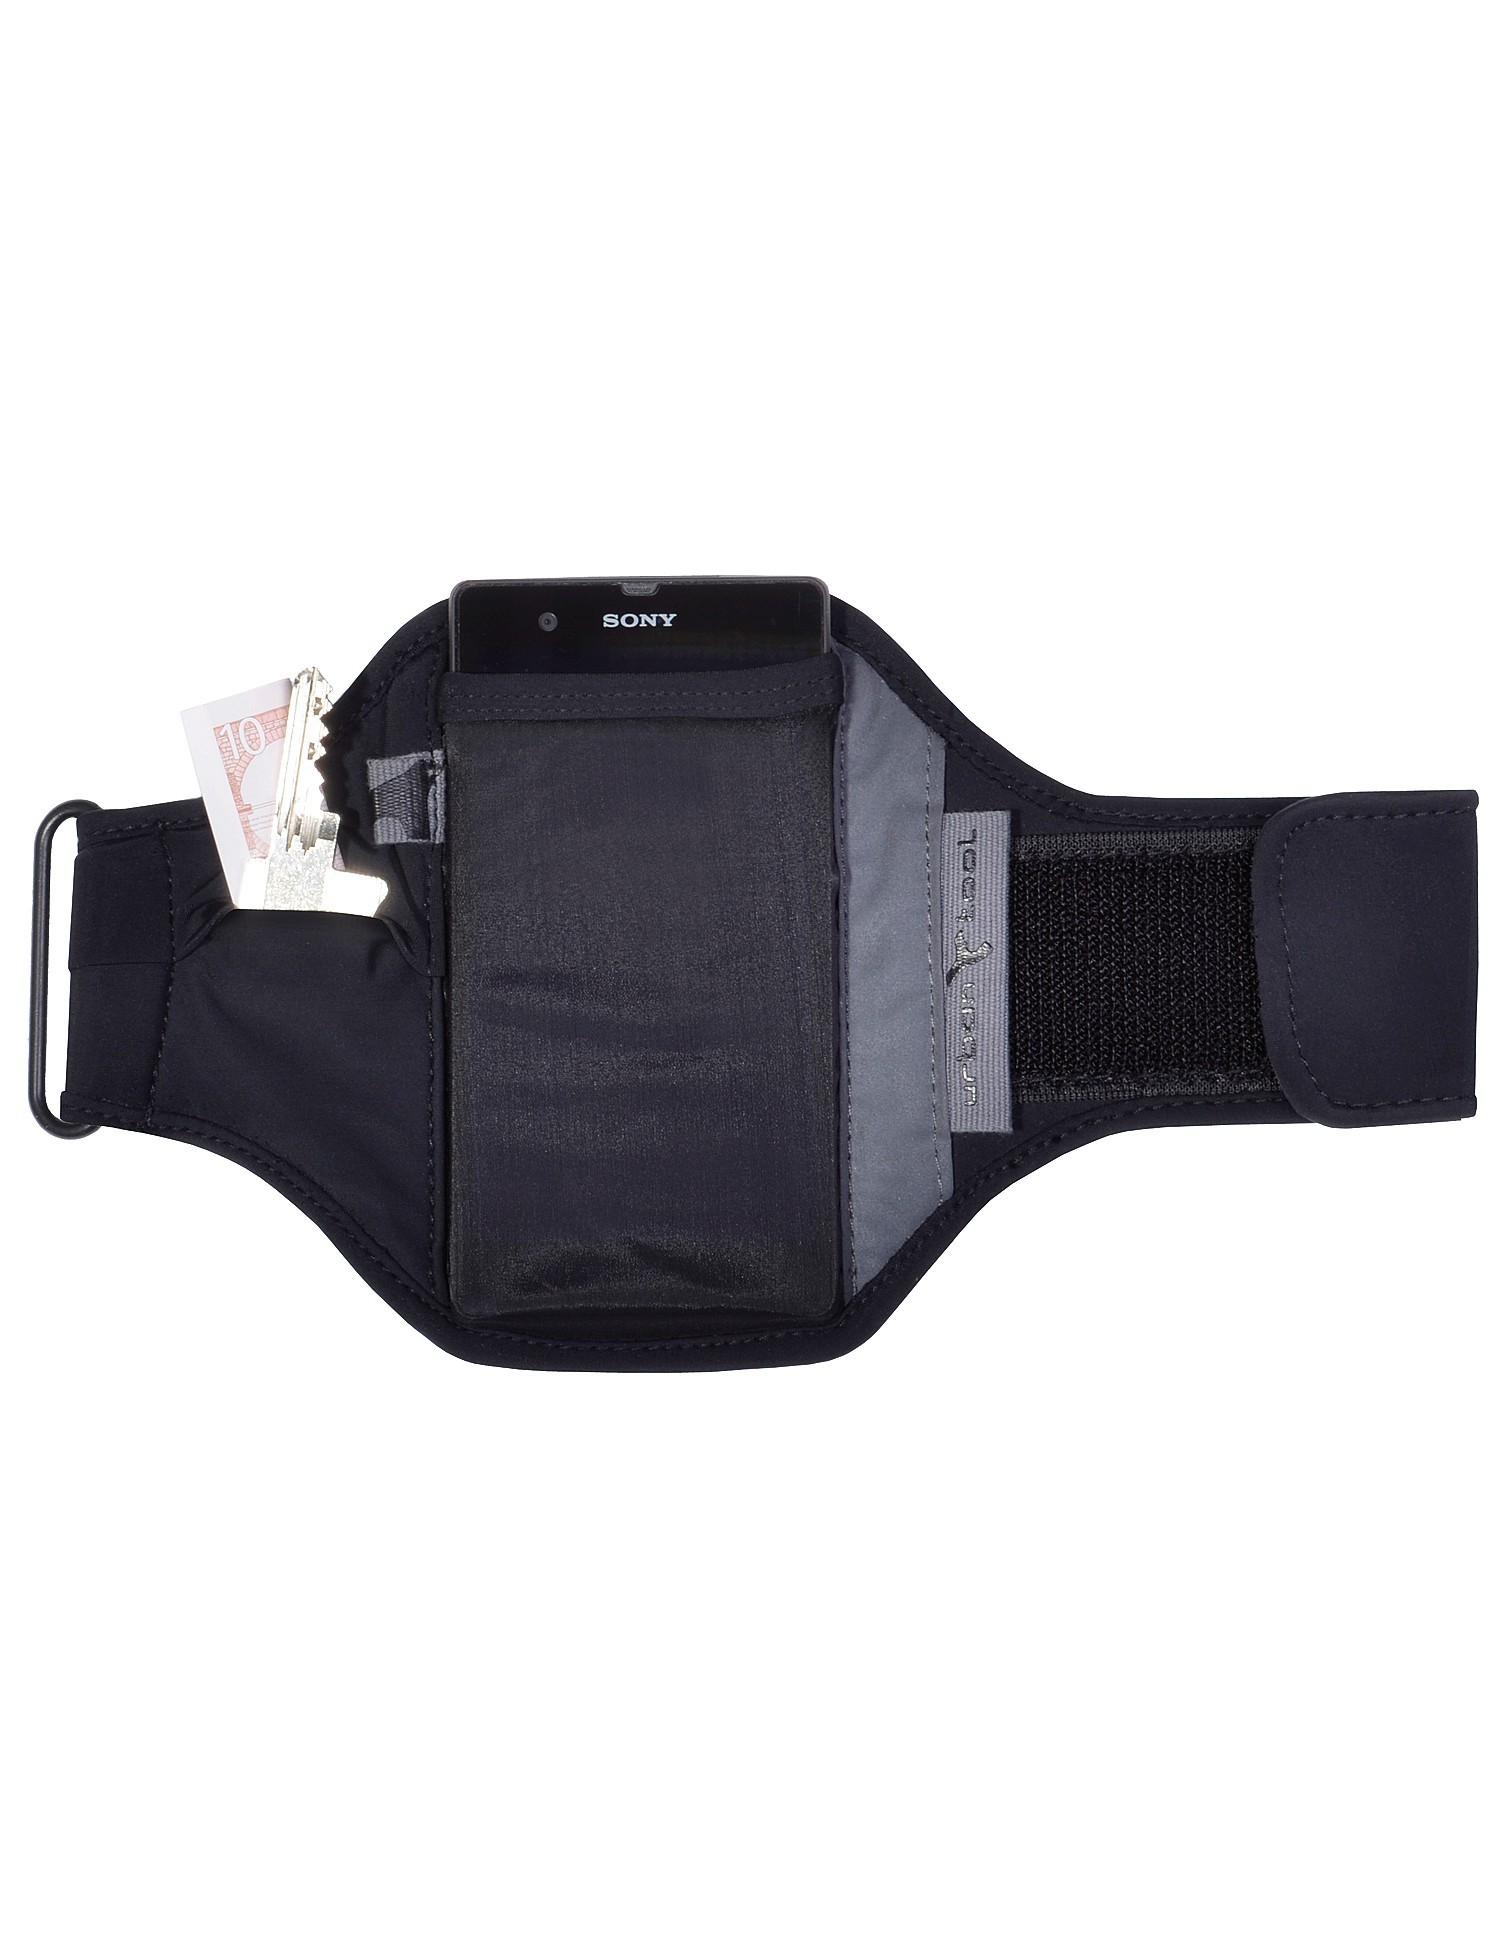 URBAN TOOL sportStrap - Sport Arm Band für 5 zoll Handys - schwarz Size 1